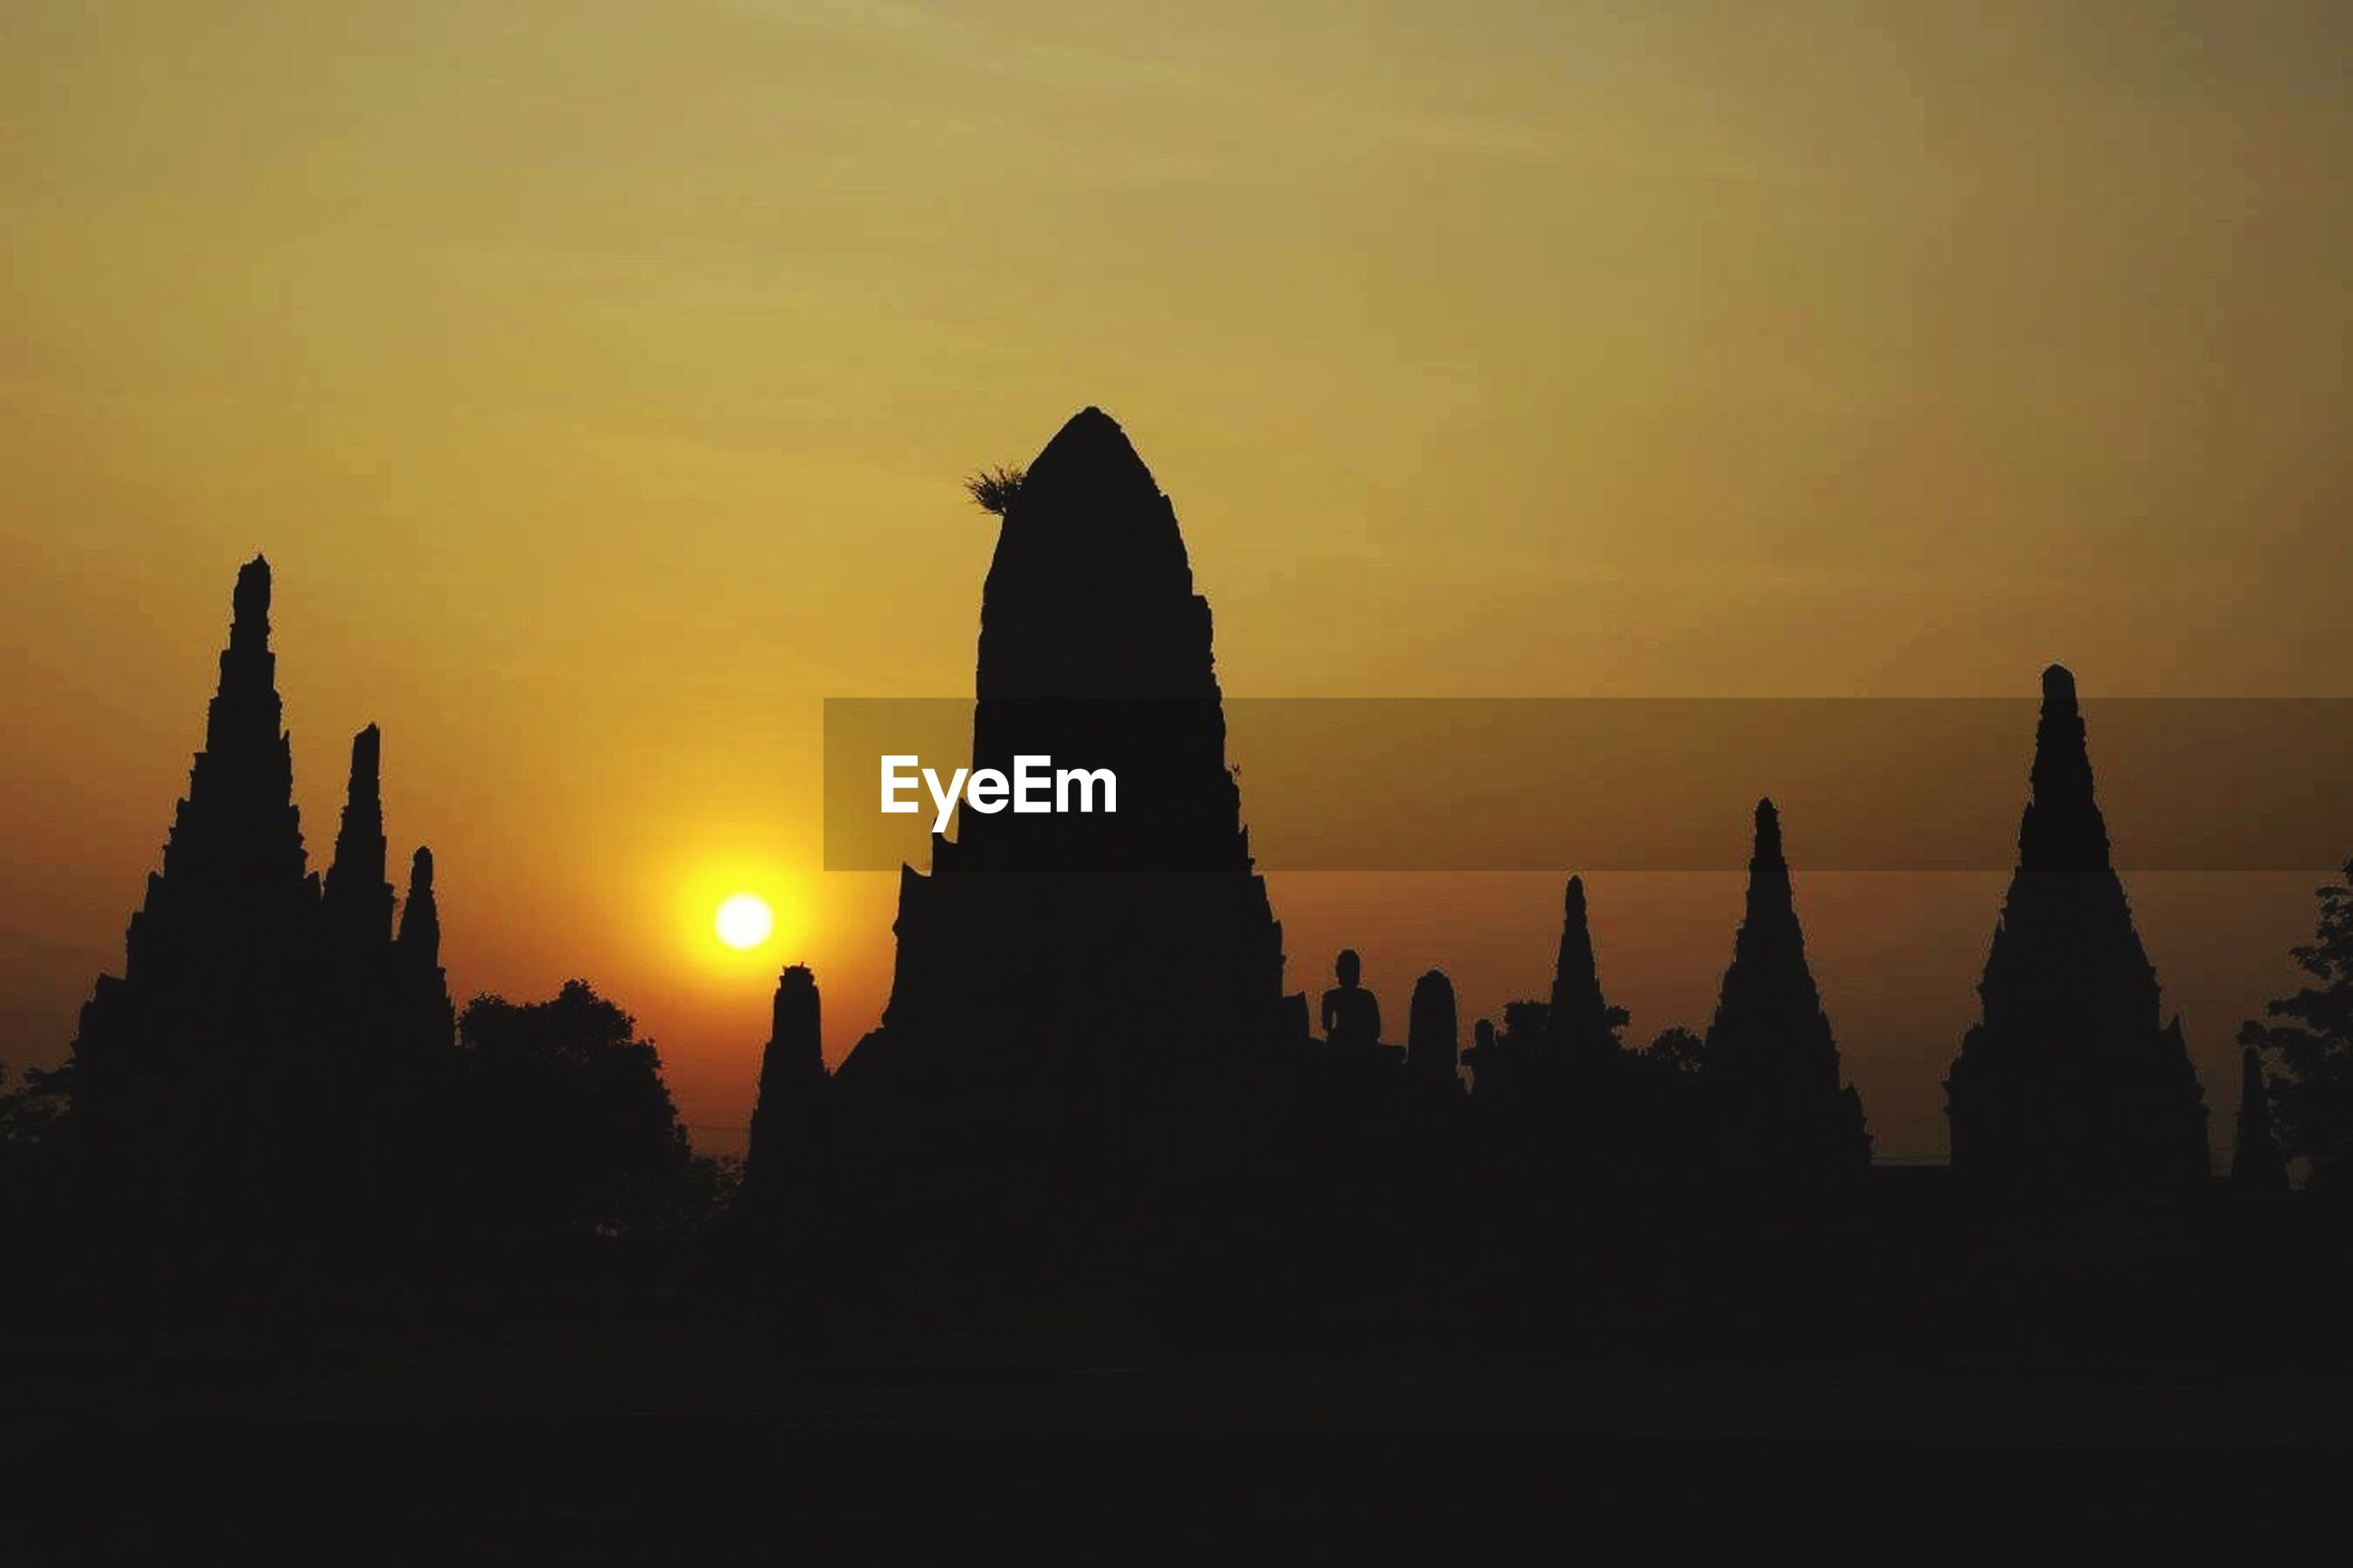 sunset, silhouette, architecture, building exterior, built structure, sun, orange color, famous place, sky, place of worship, religion, travel destinations, travel, spirituality, international landmark, temple - building, tourism, history, low angle view